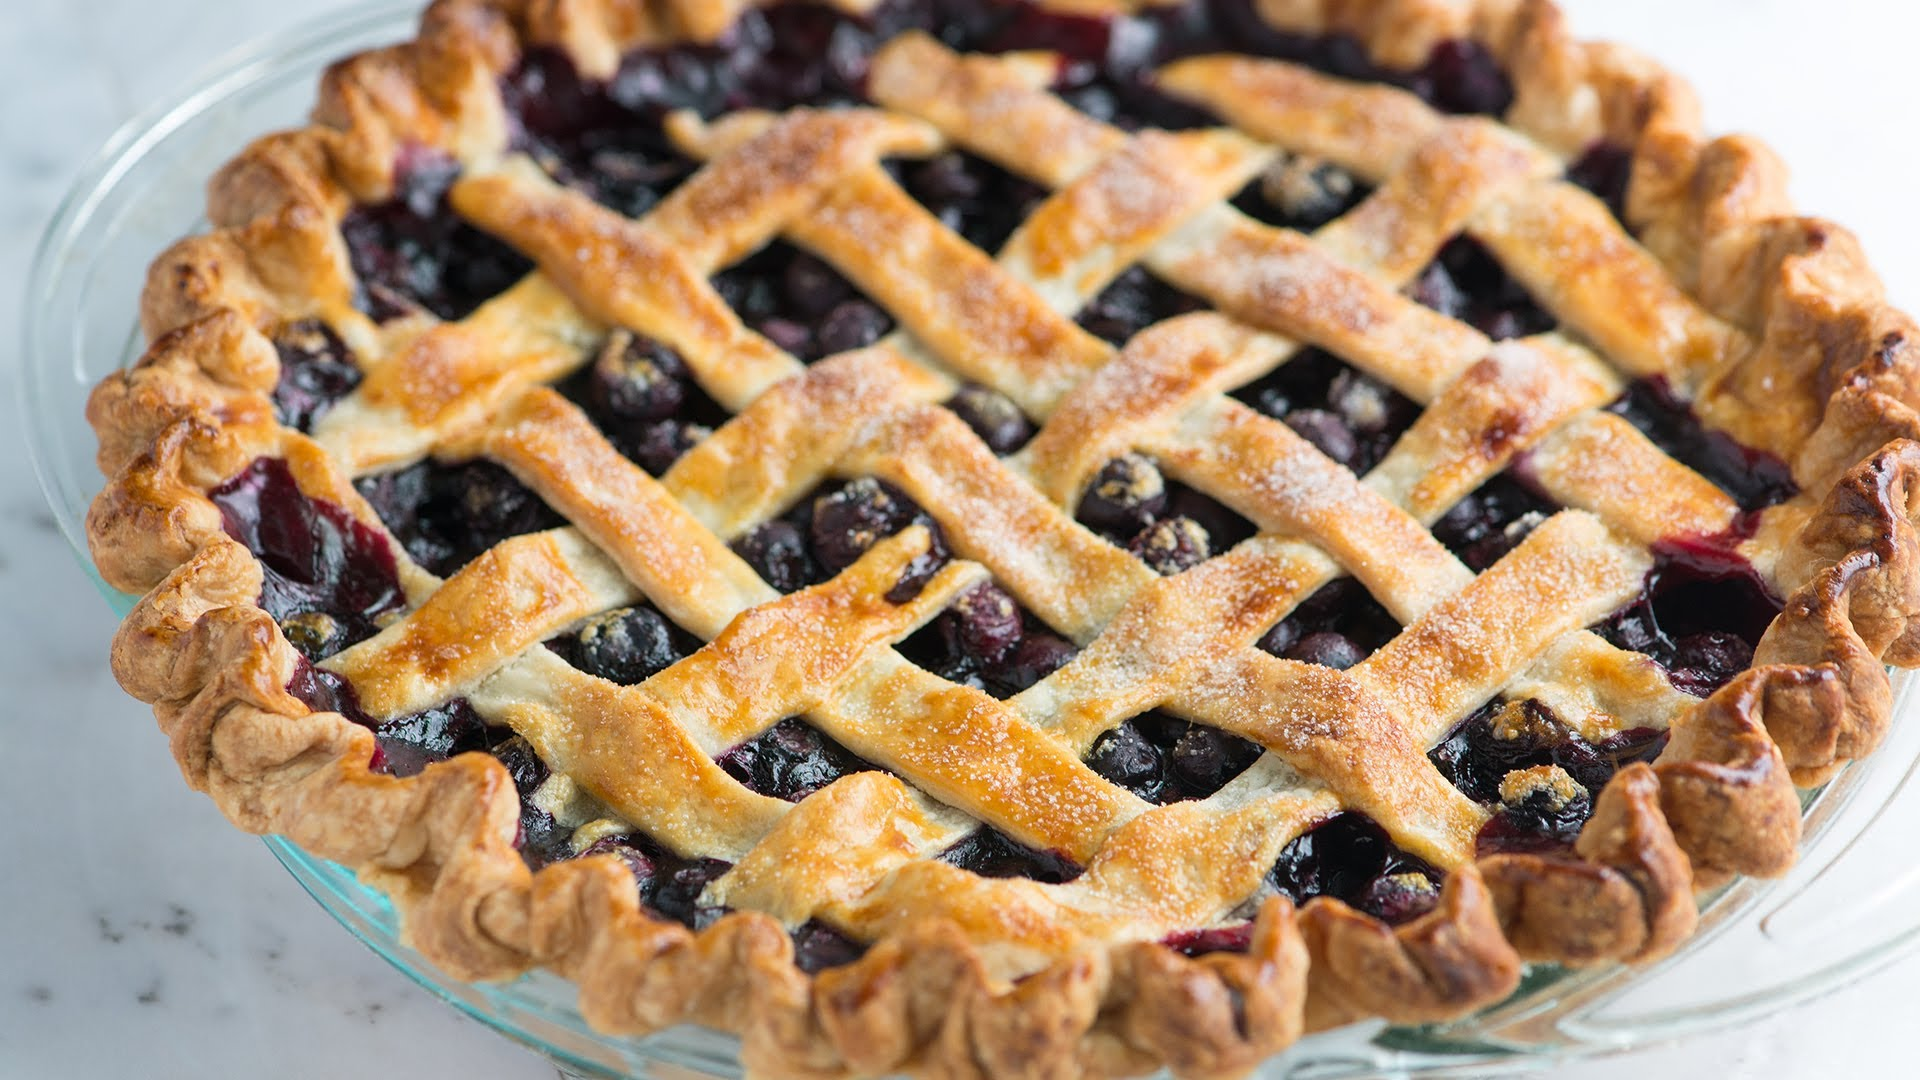 How to Make Homemade Blueberry Pie